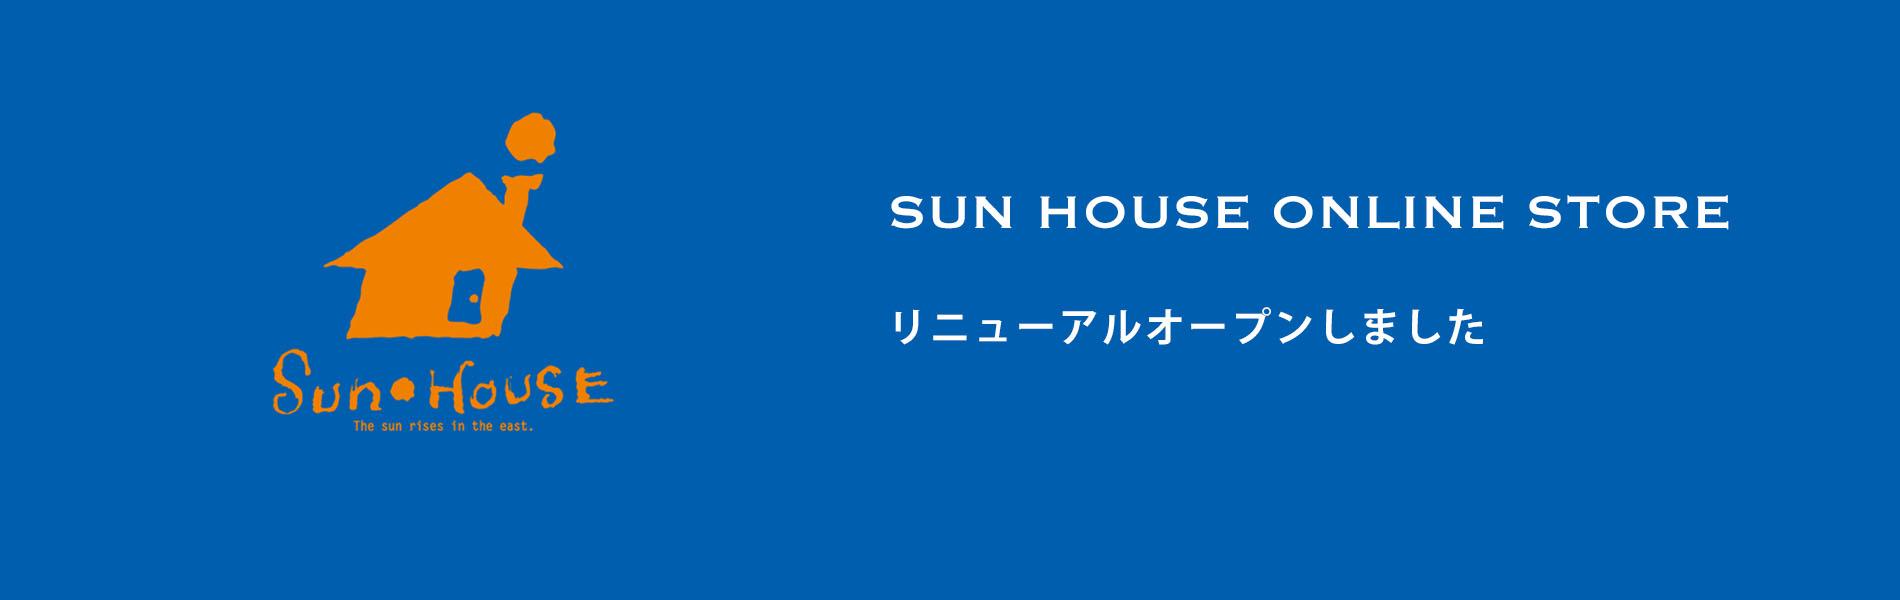 SUN HOUSE ONLINE STORE リニューアル